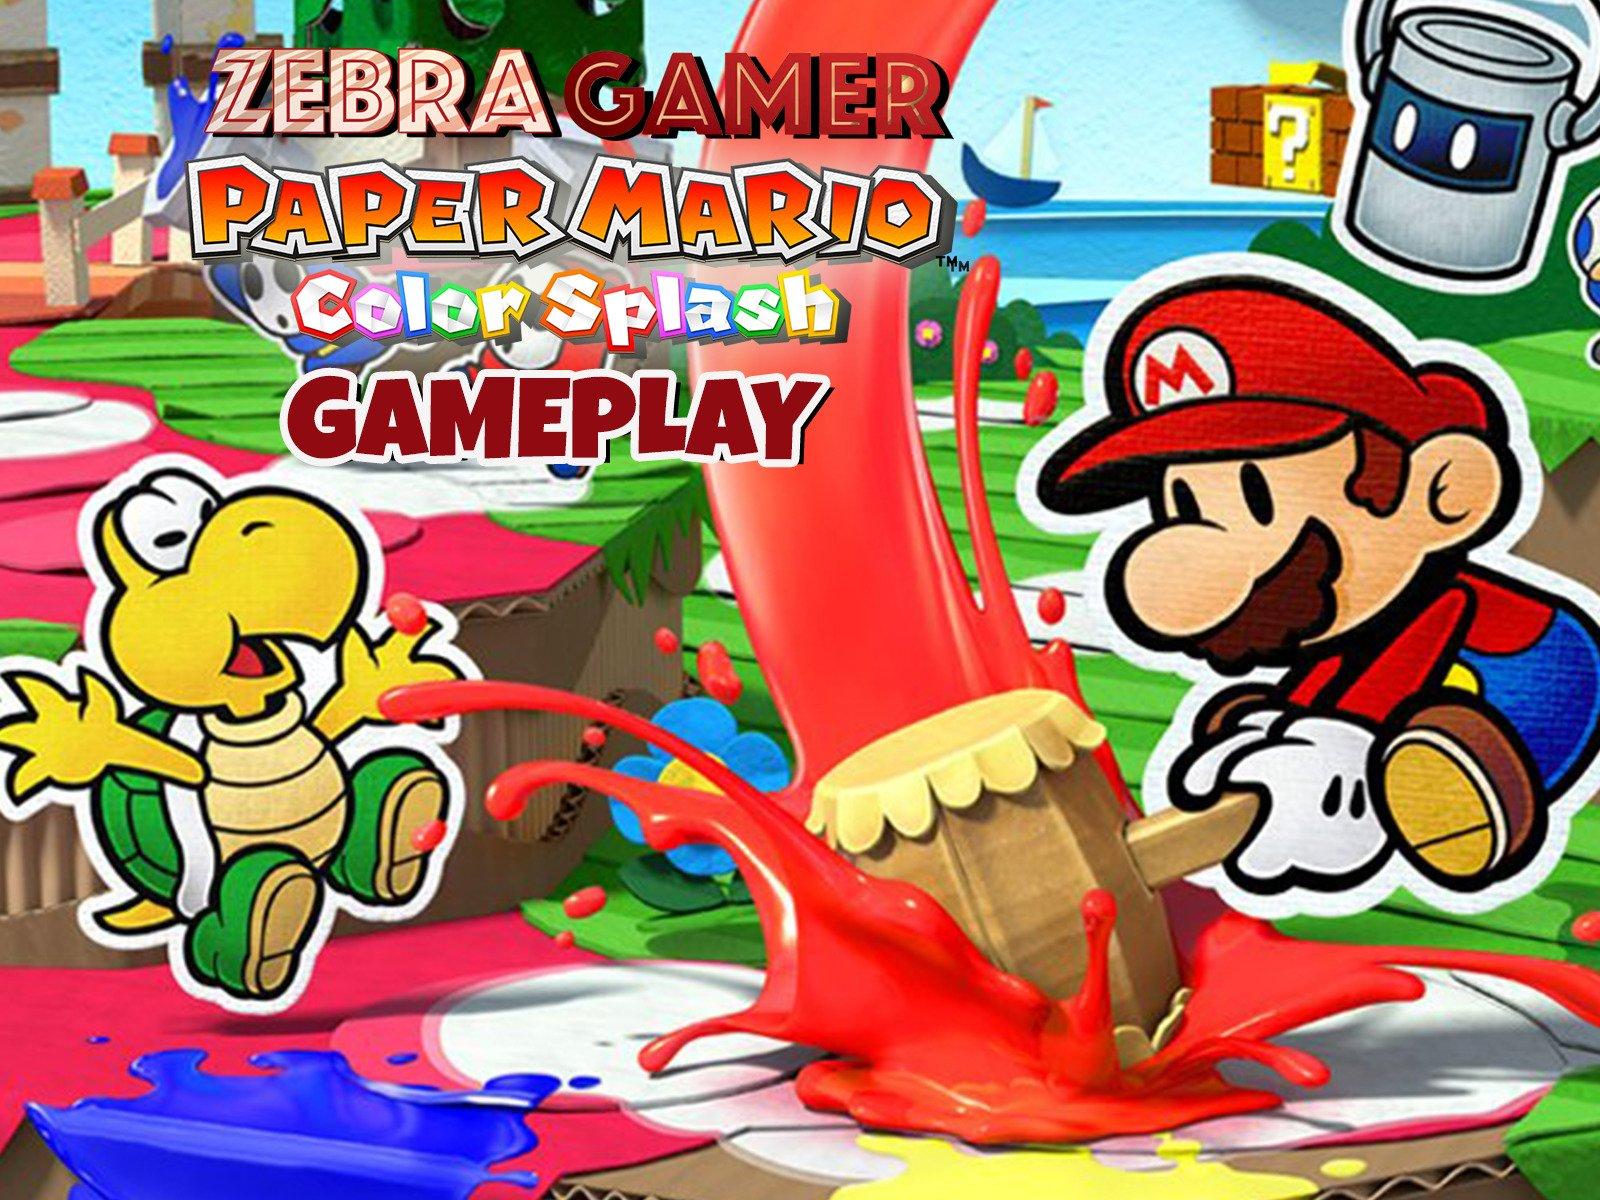 Watch Paper Mario Color Splash Gameplay On Amazon Prime Video Uk